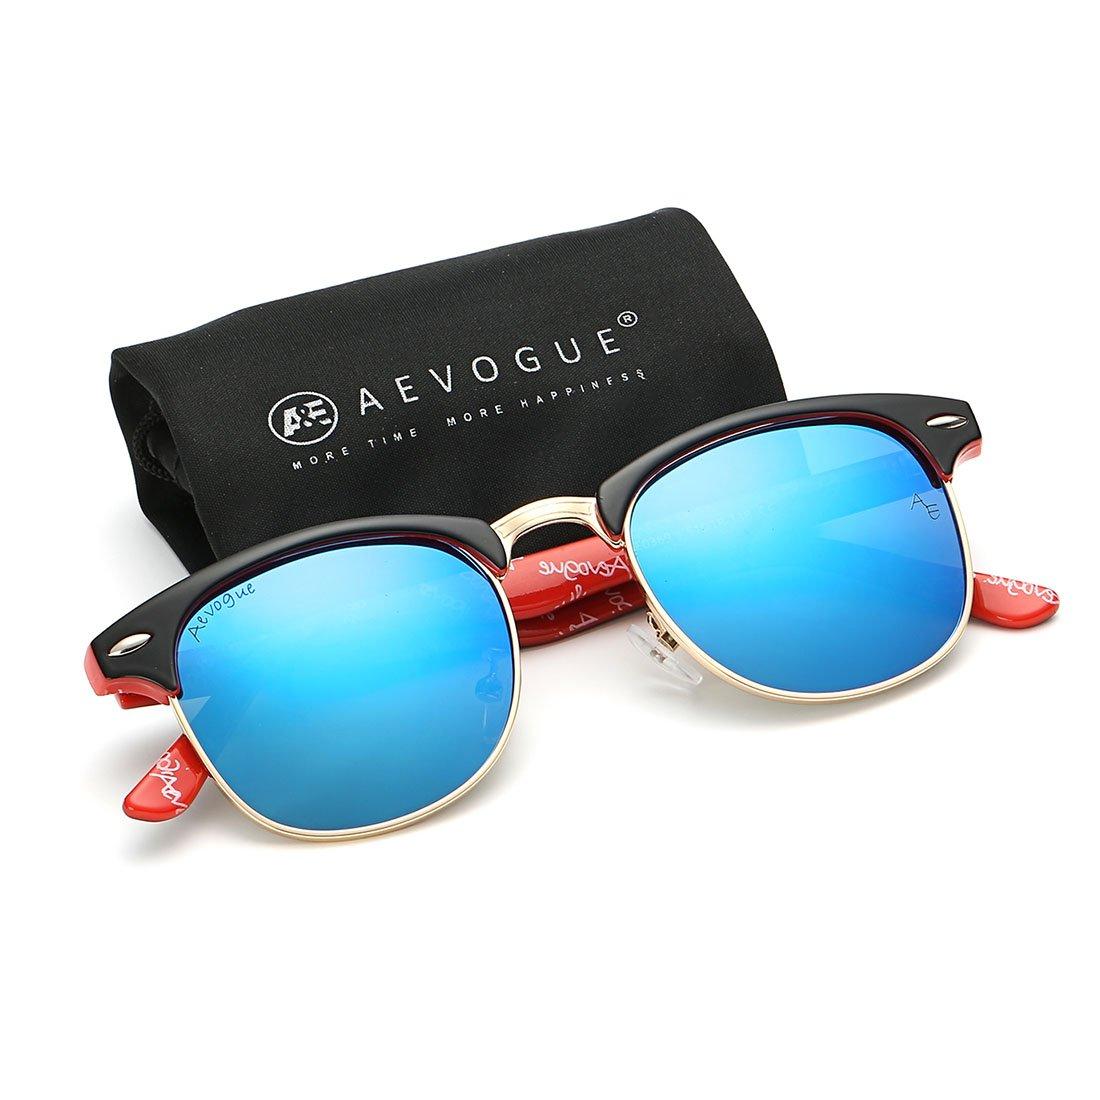 AEVOGUE Polarized Sunglasses Semi-Rimless Frame Brand Designer Classic AE0369 (Black&red&blue, 48)